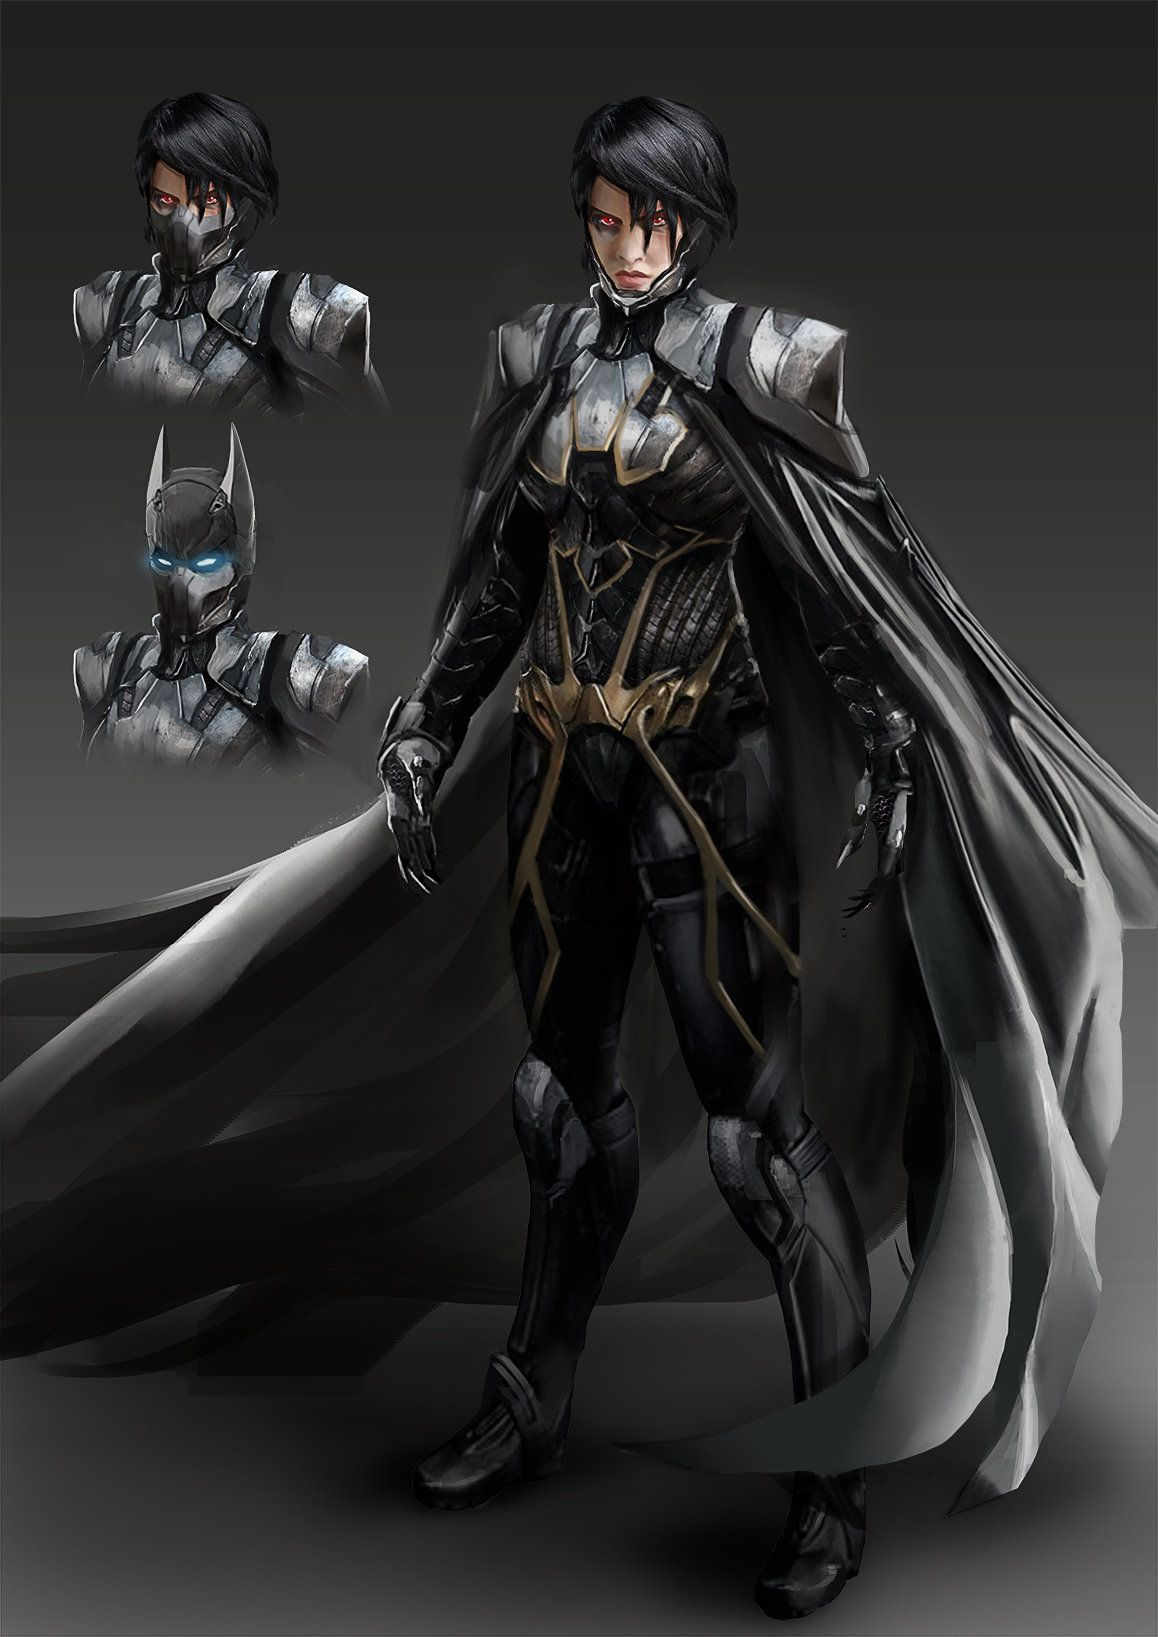 Batgirl redesign | Batgirl, Cassandra cain, Batman